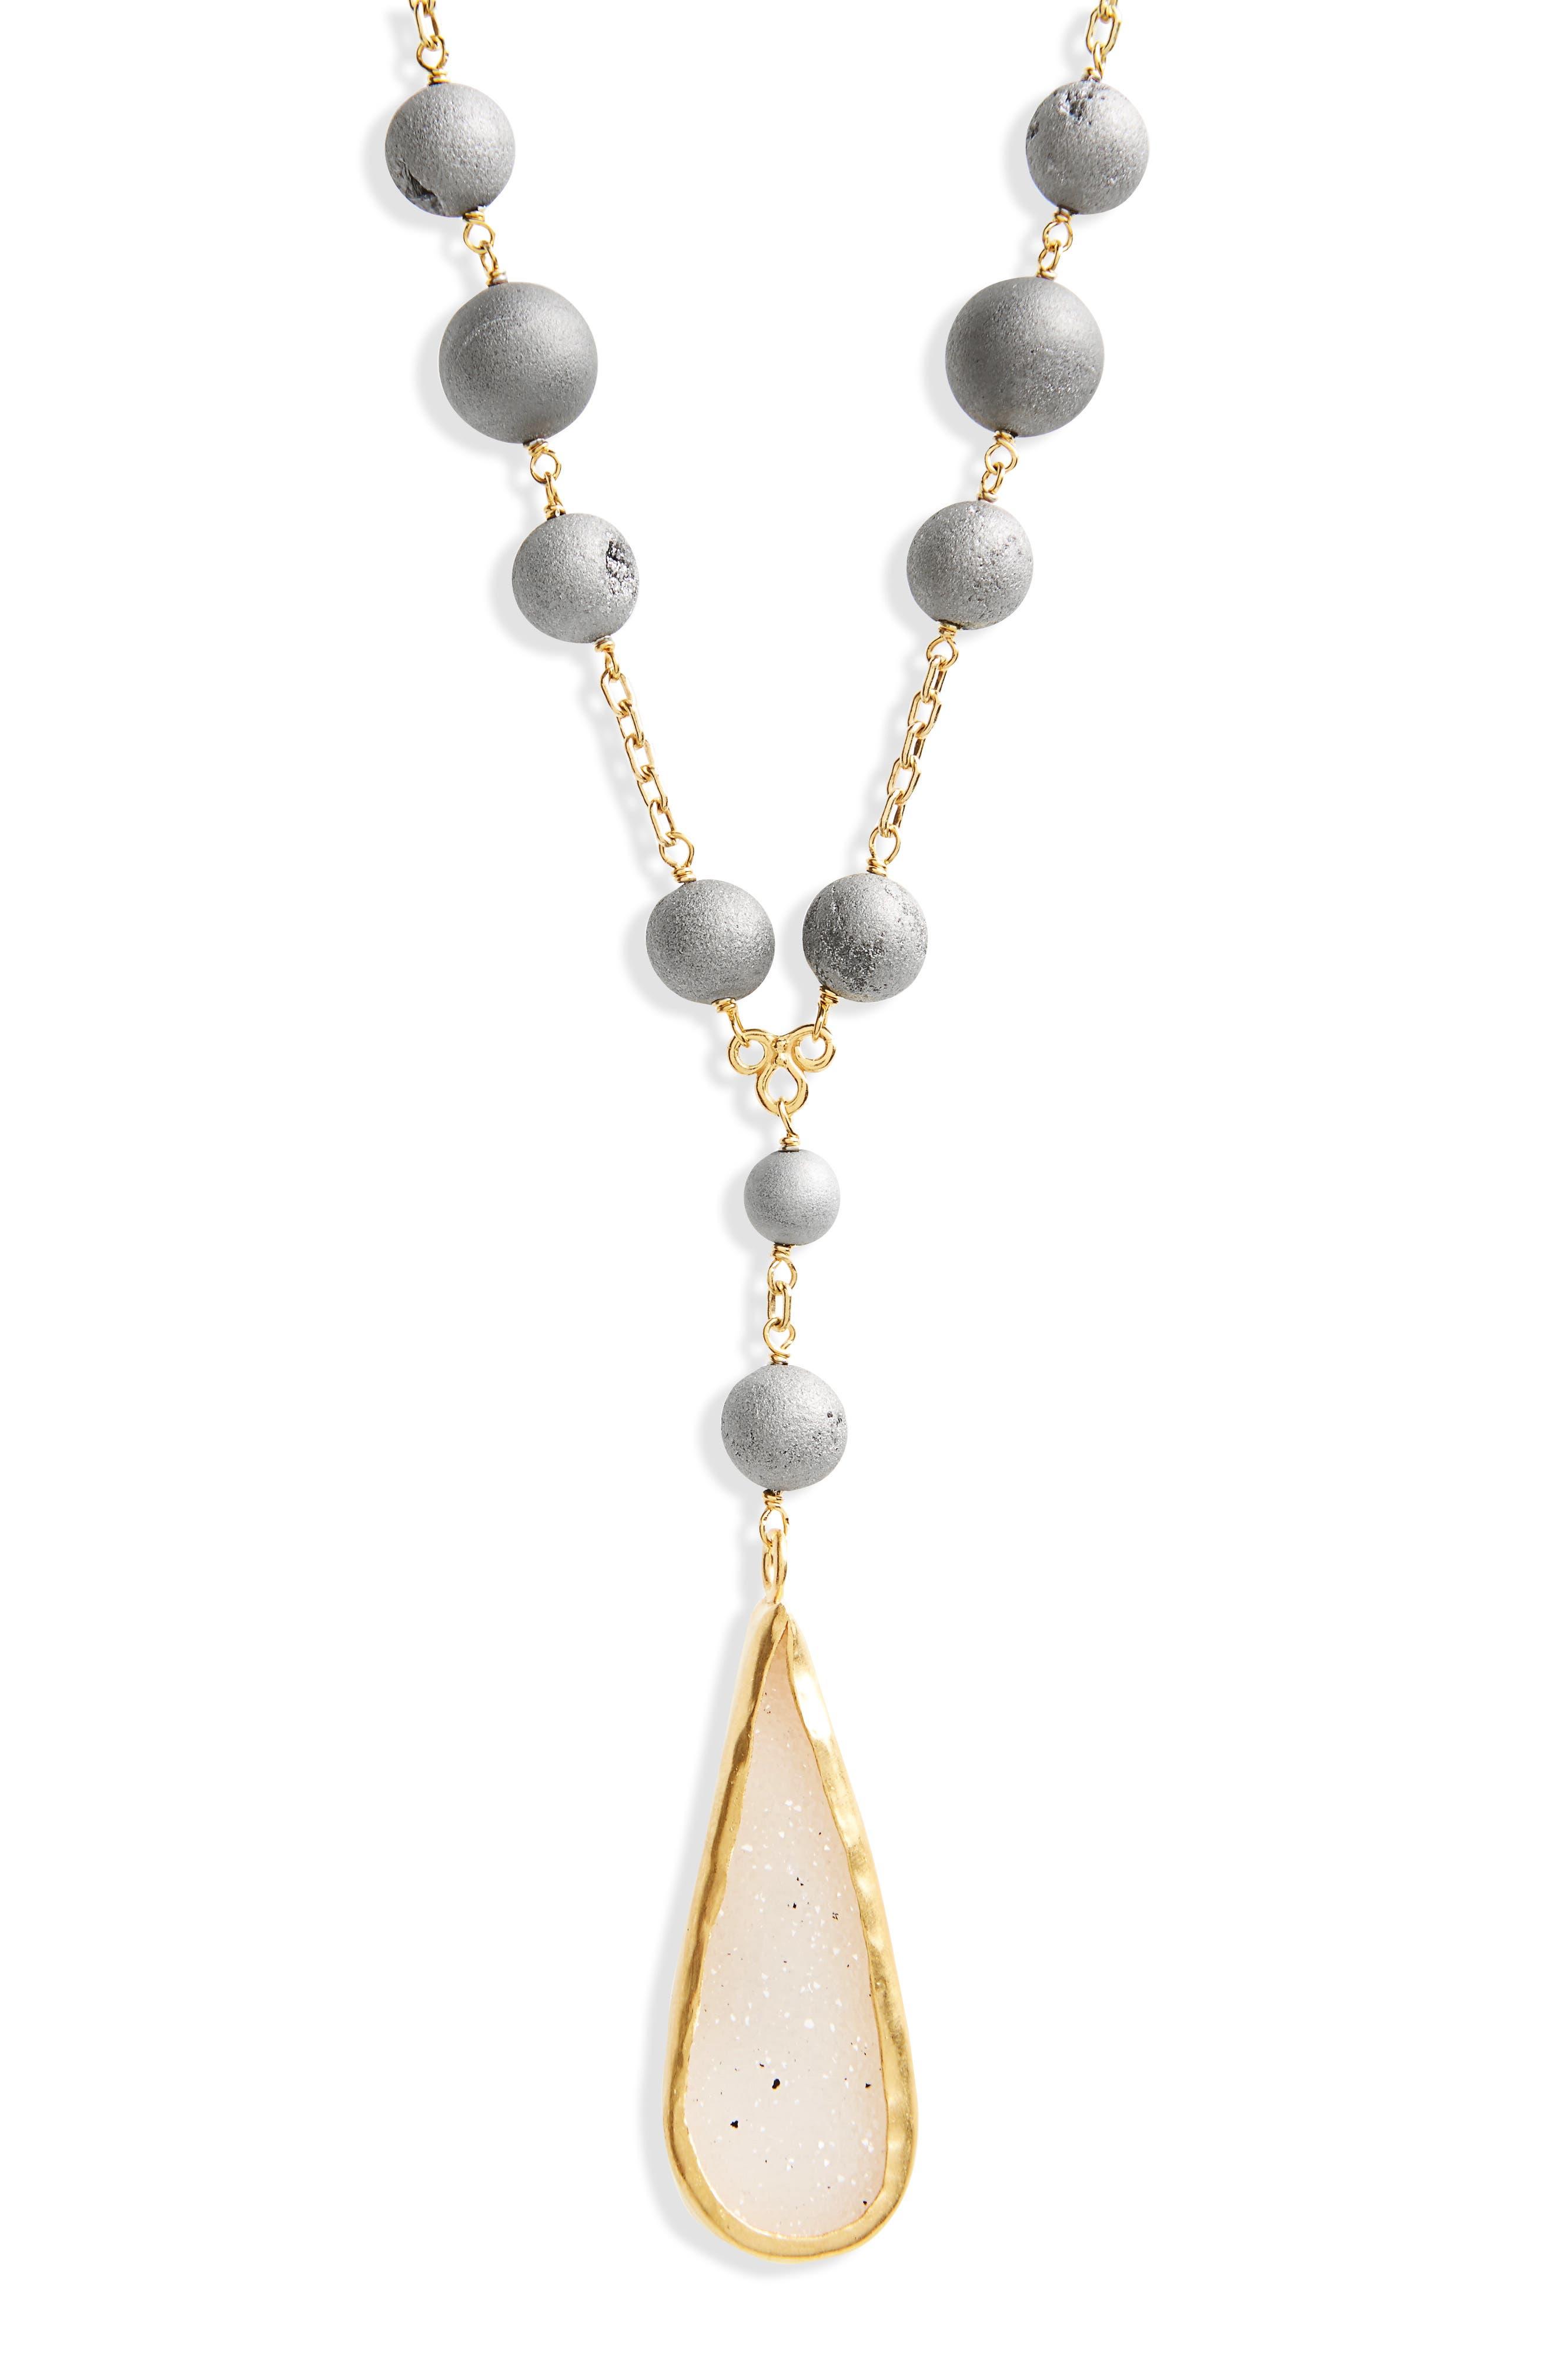 Drusy Agate Pendant Necklace,                             Alternate thumbnail 2, color,                             Silver Agate